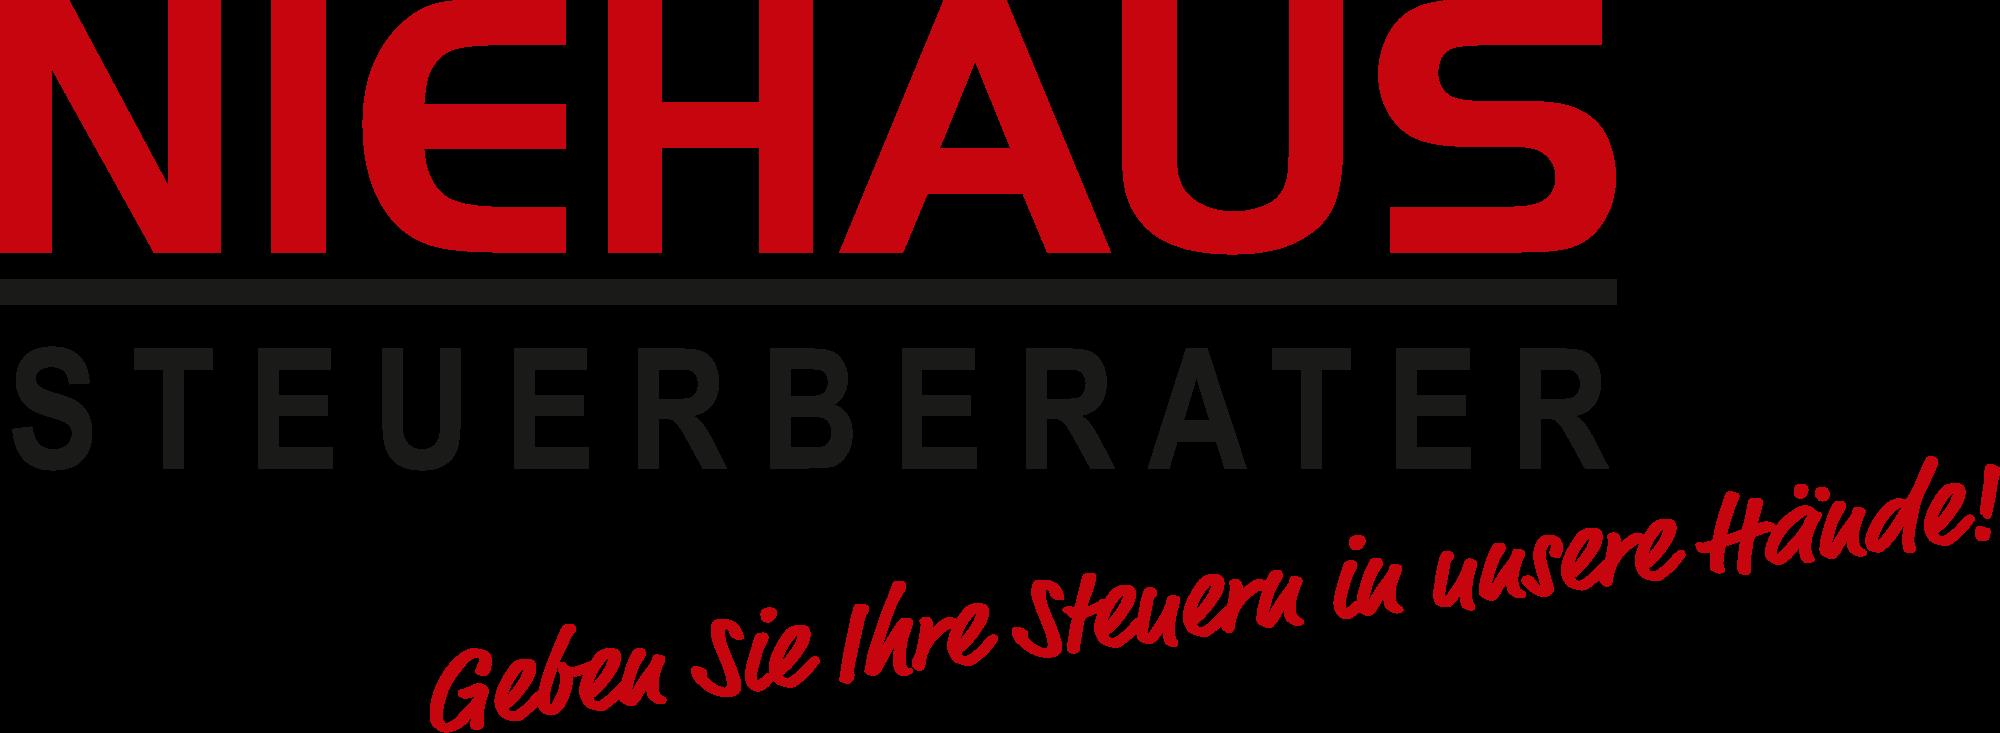 Holger Niehaus Steuerberater